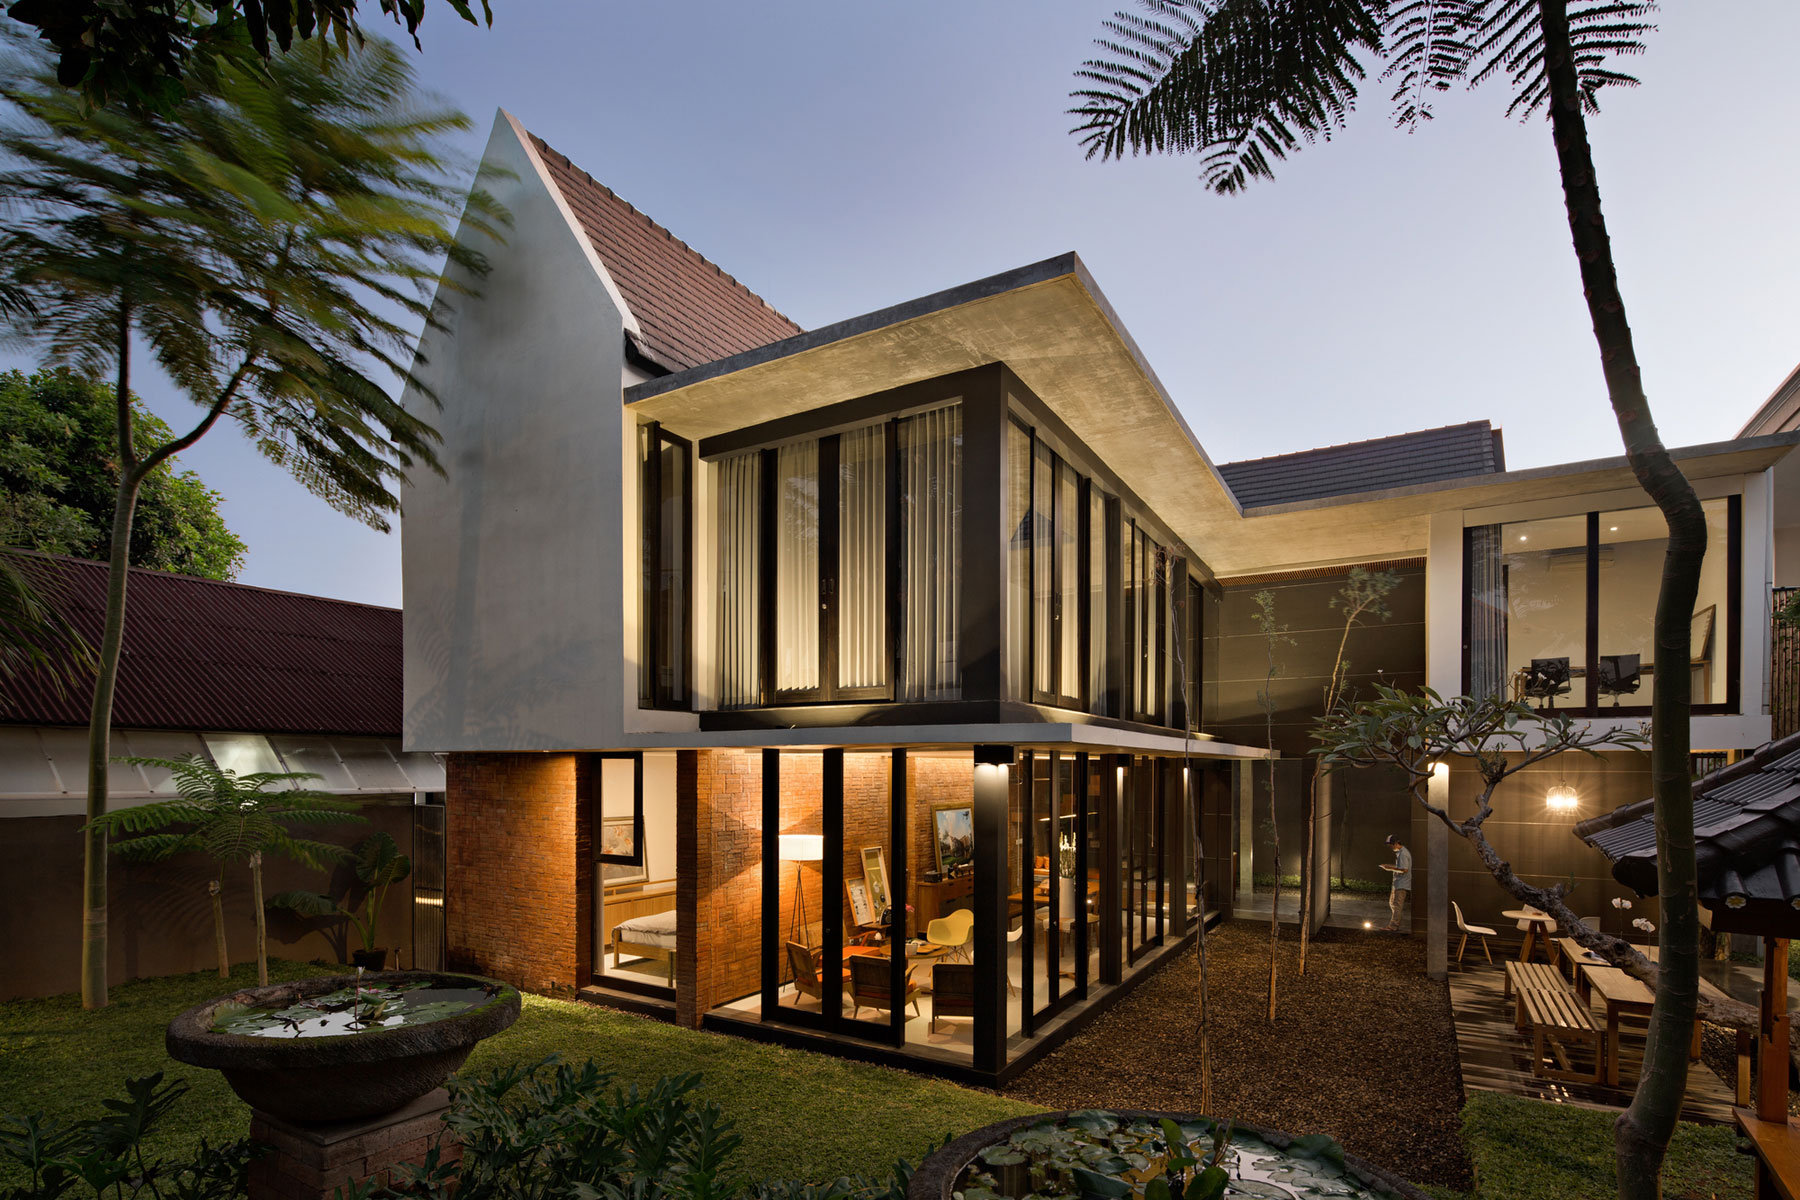 Indonesia Archives HomeDSGN